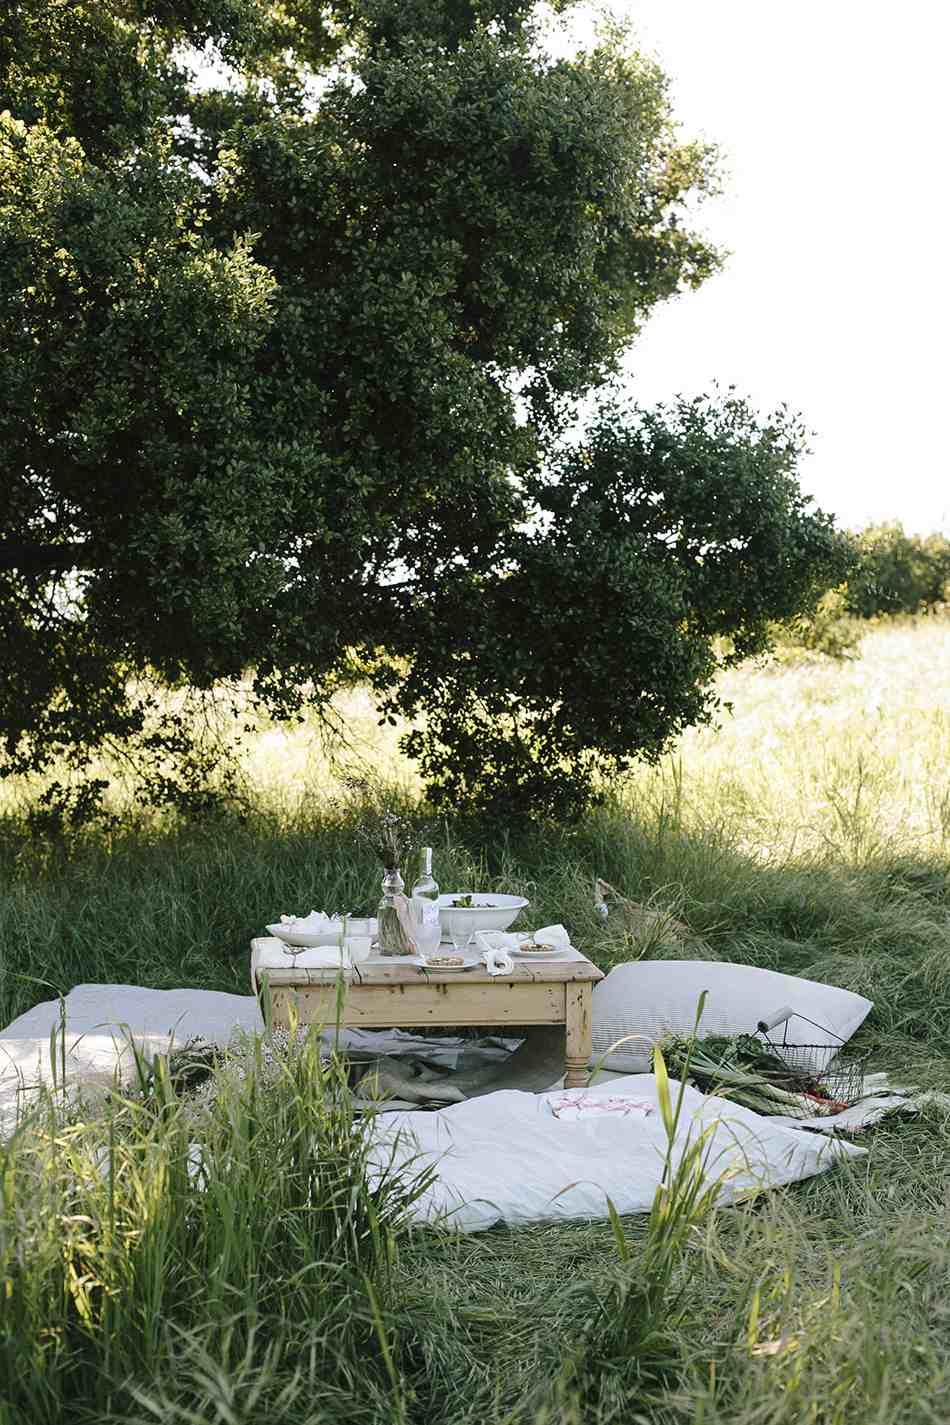 picnic setup with pillows as seats